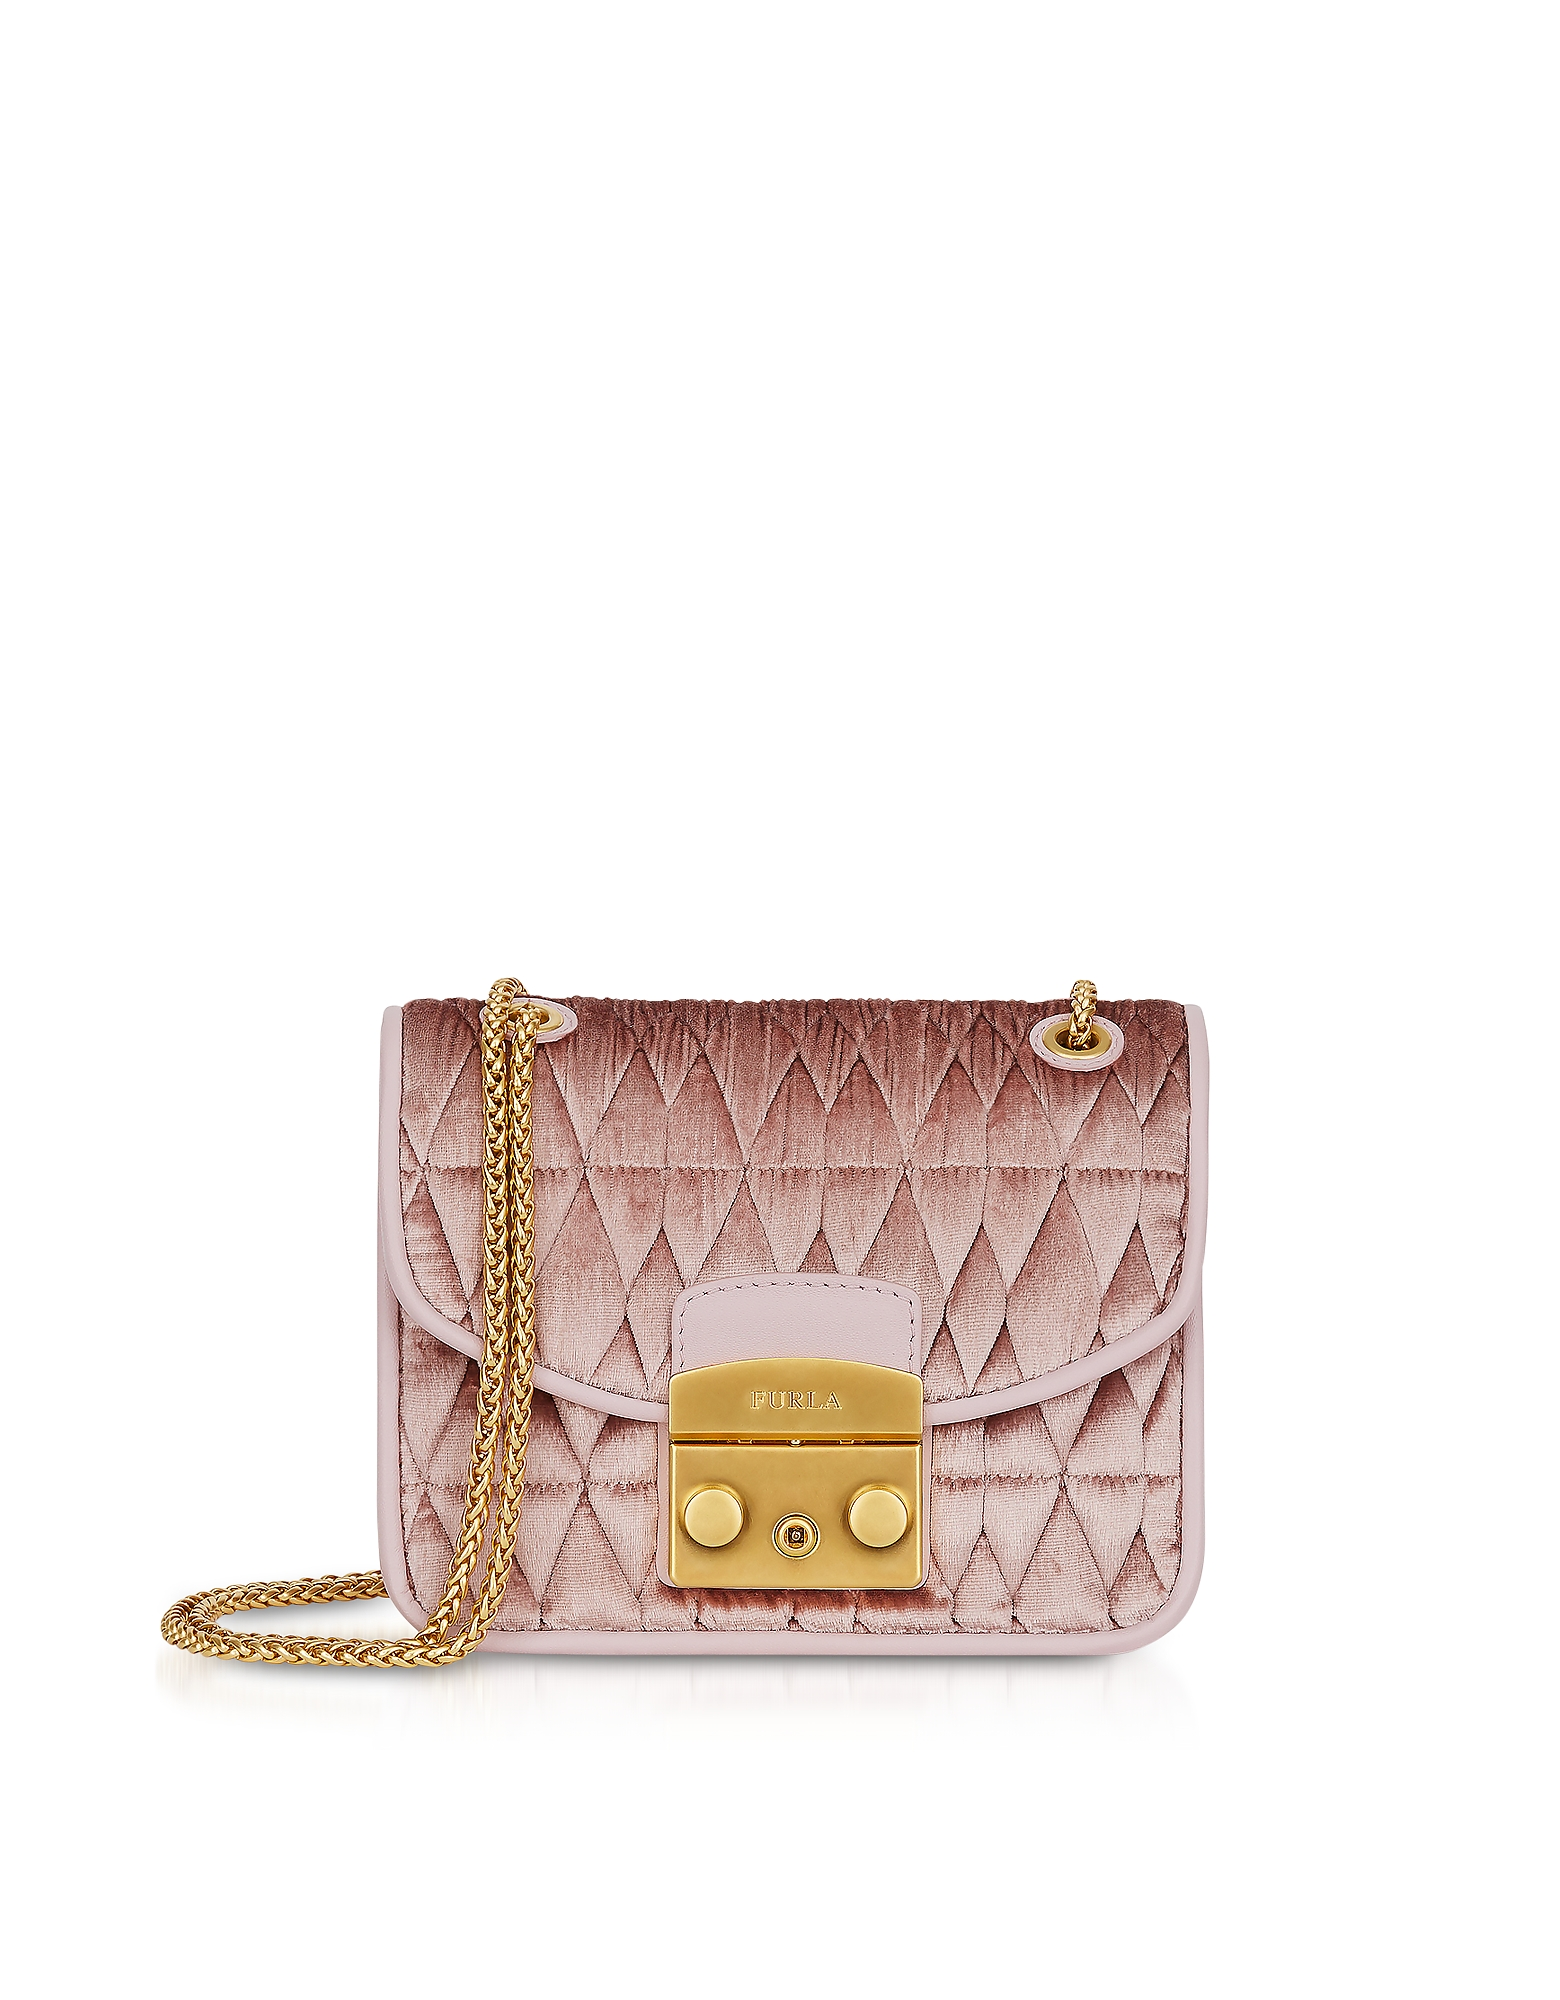 Furla Handbags, Quilted Velvet Metropolis Cometa Mini Crossbody Bag